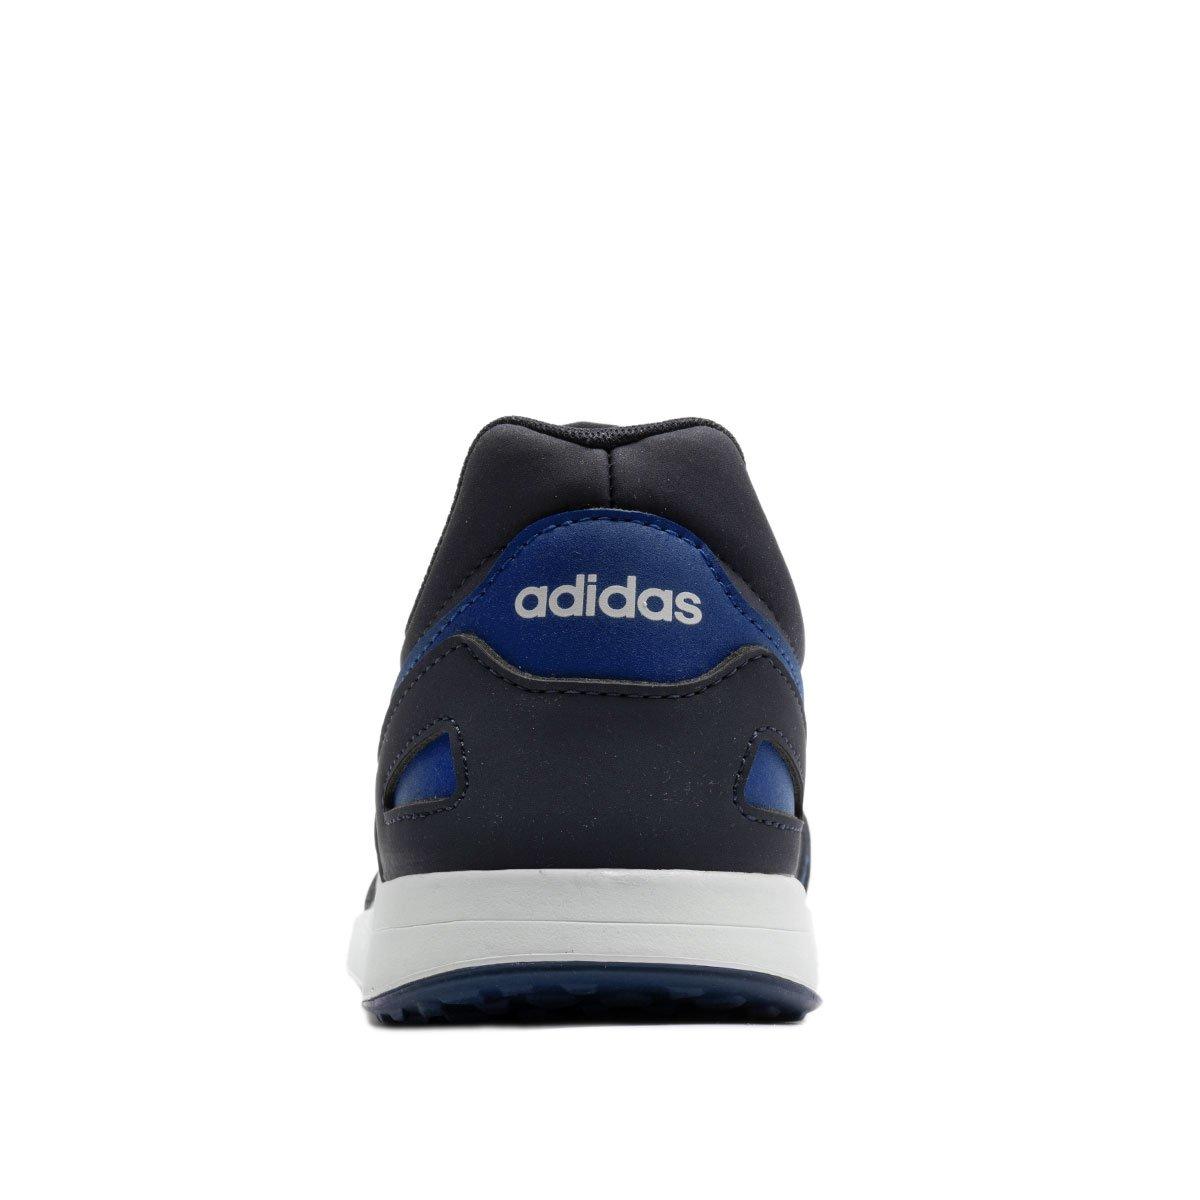 Adidas VS Switch 3